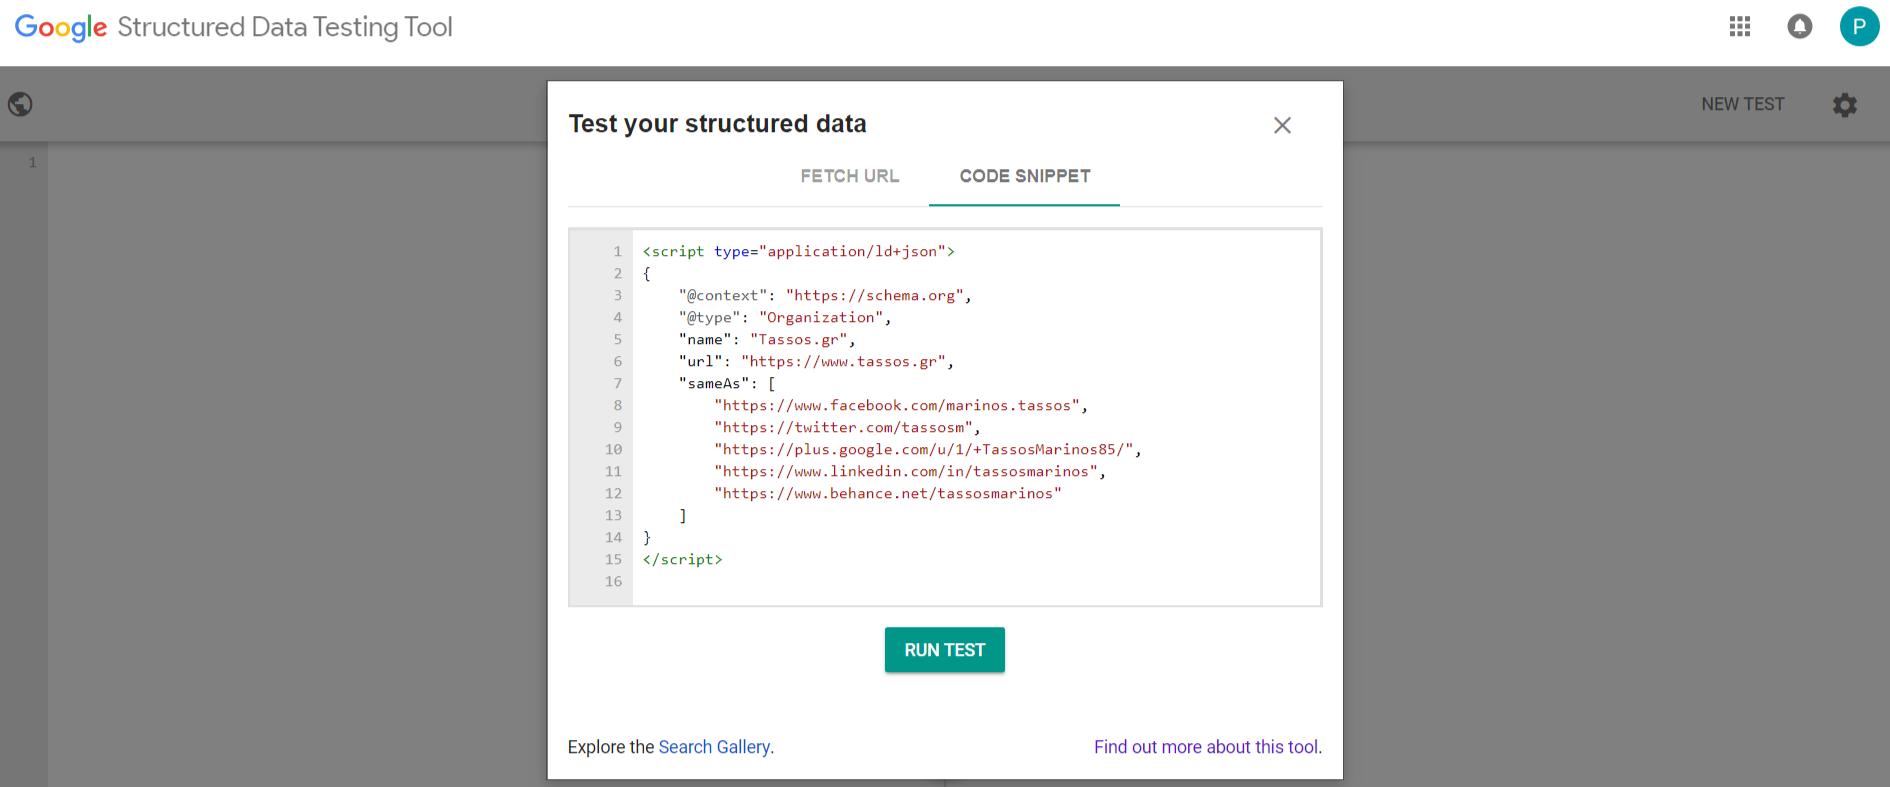 Google Stuctured Data Testing Tool